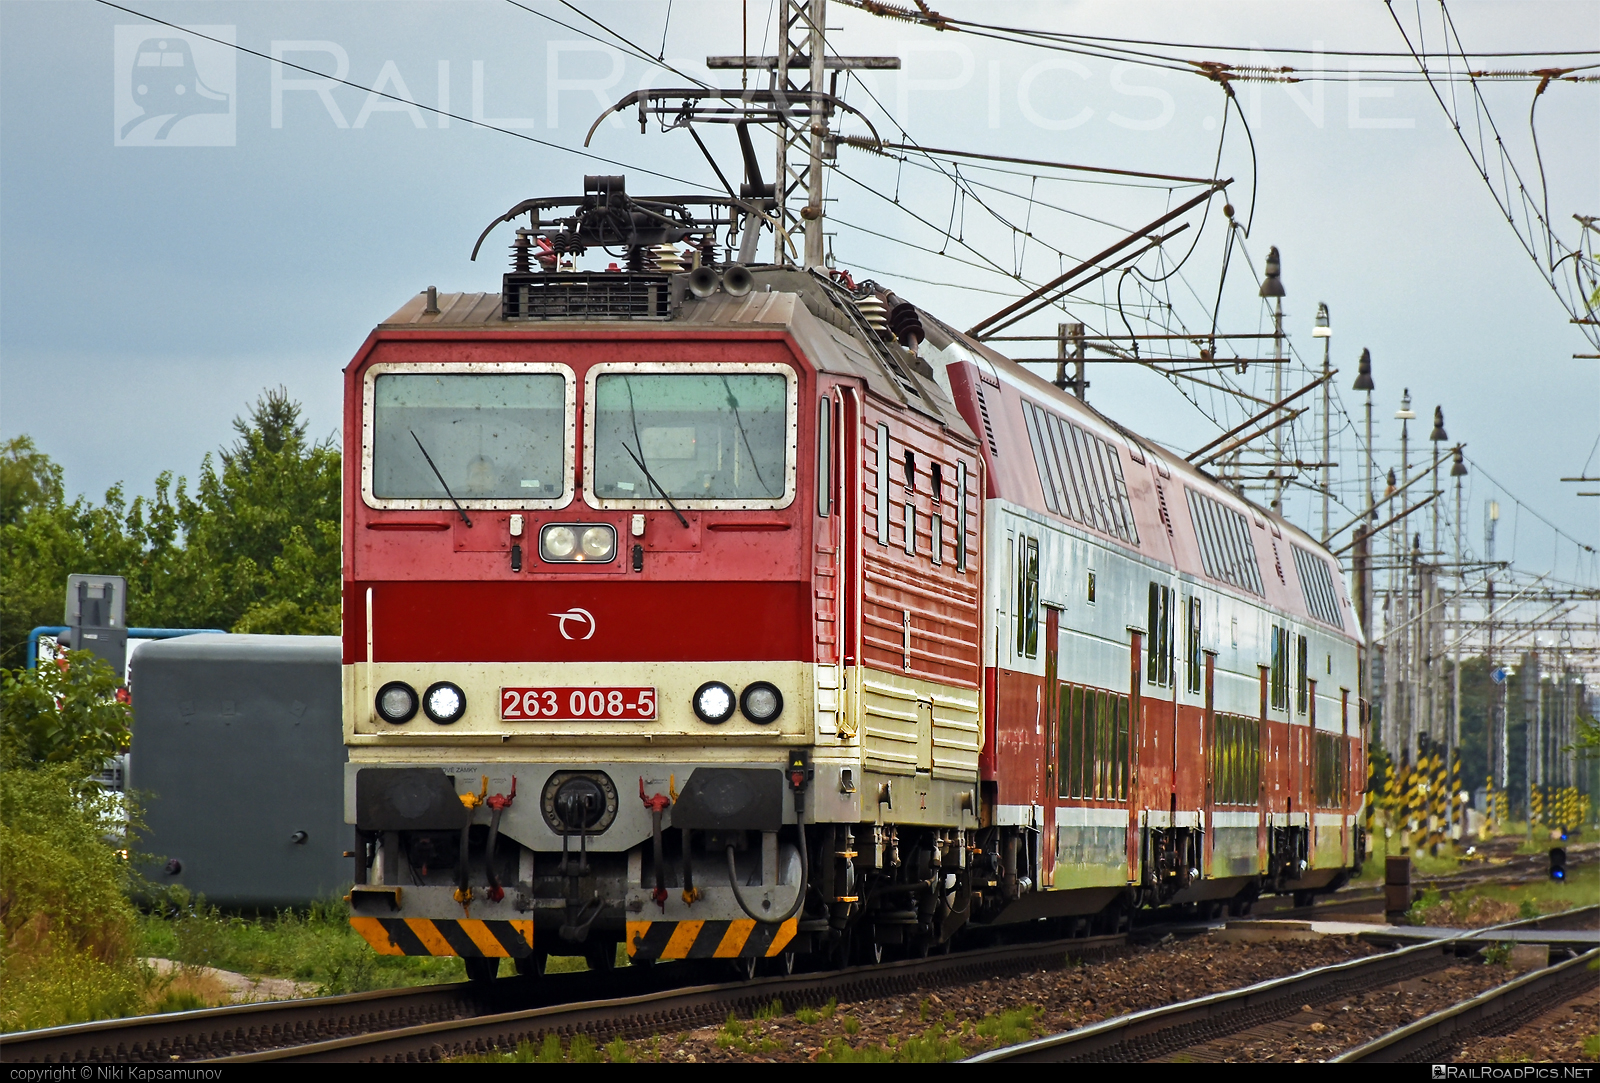 Škoda 70E - 263 008-5 operated by Železničná Spoločnost' Slovensko, a.s. #ZeleznicnaSpolocnostSlovensko #locomotive263 #princezna #skoda #skoda70e #zssk